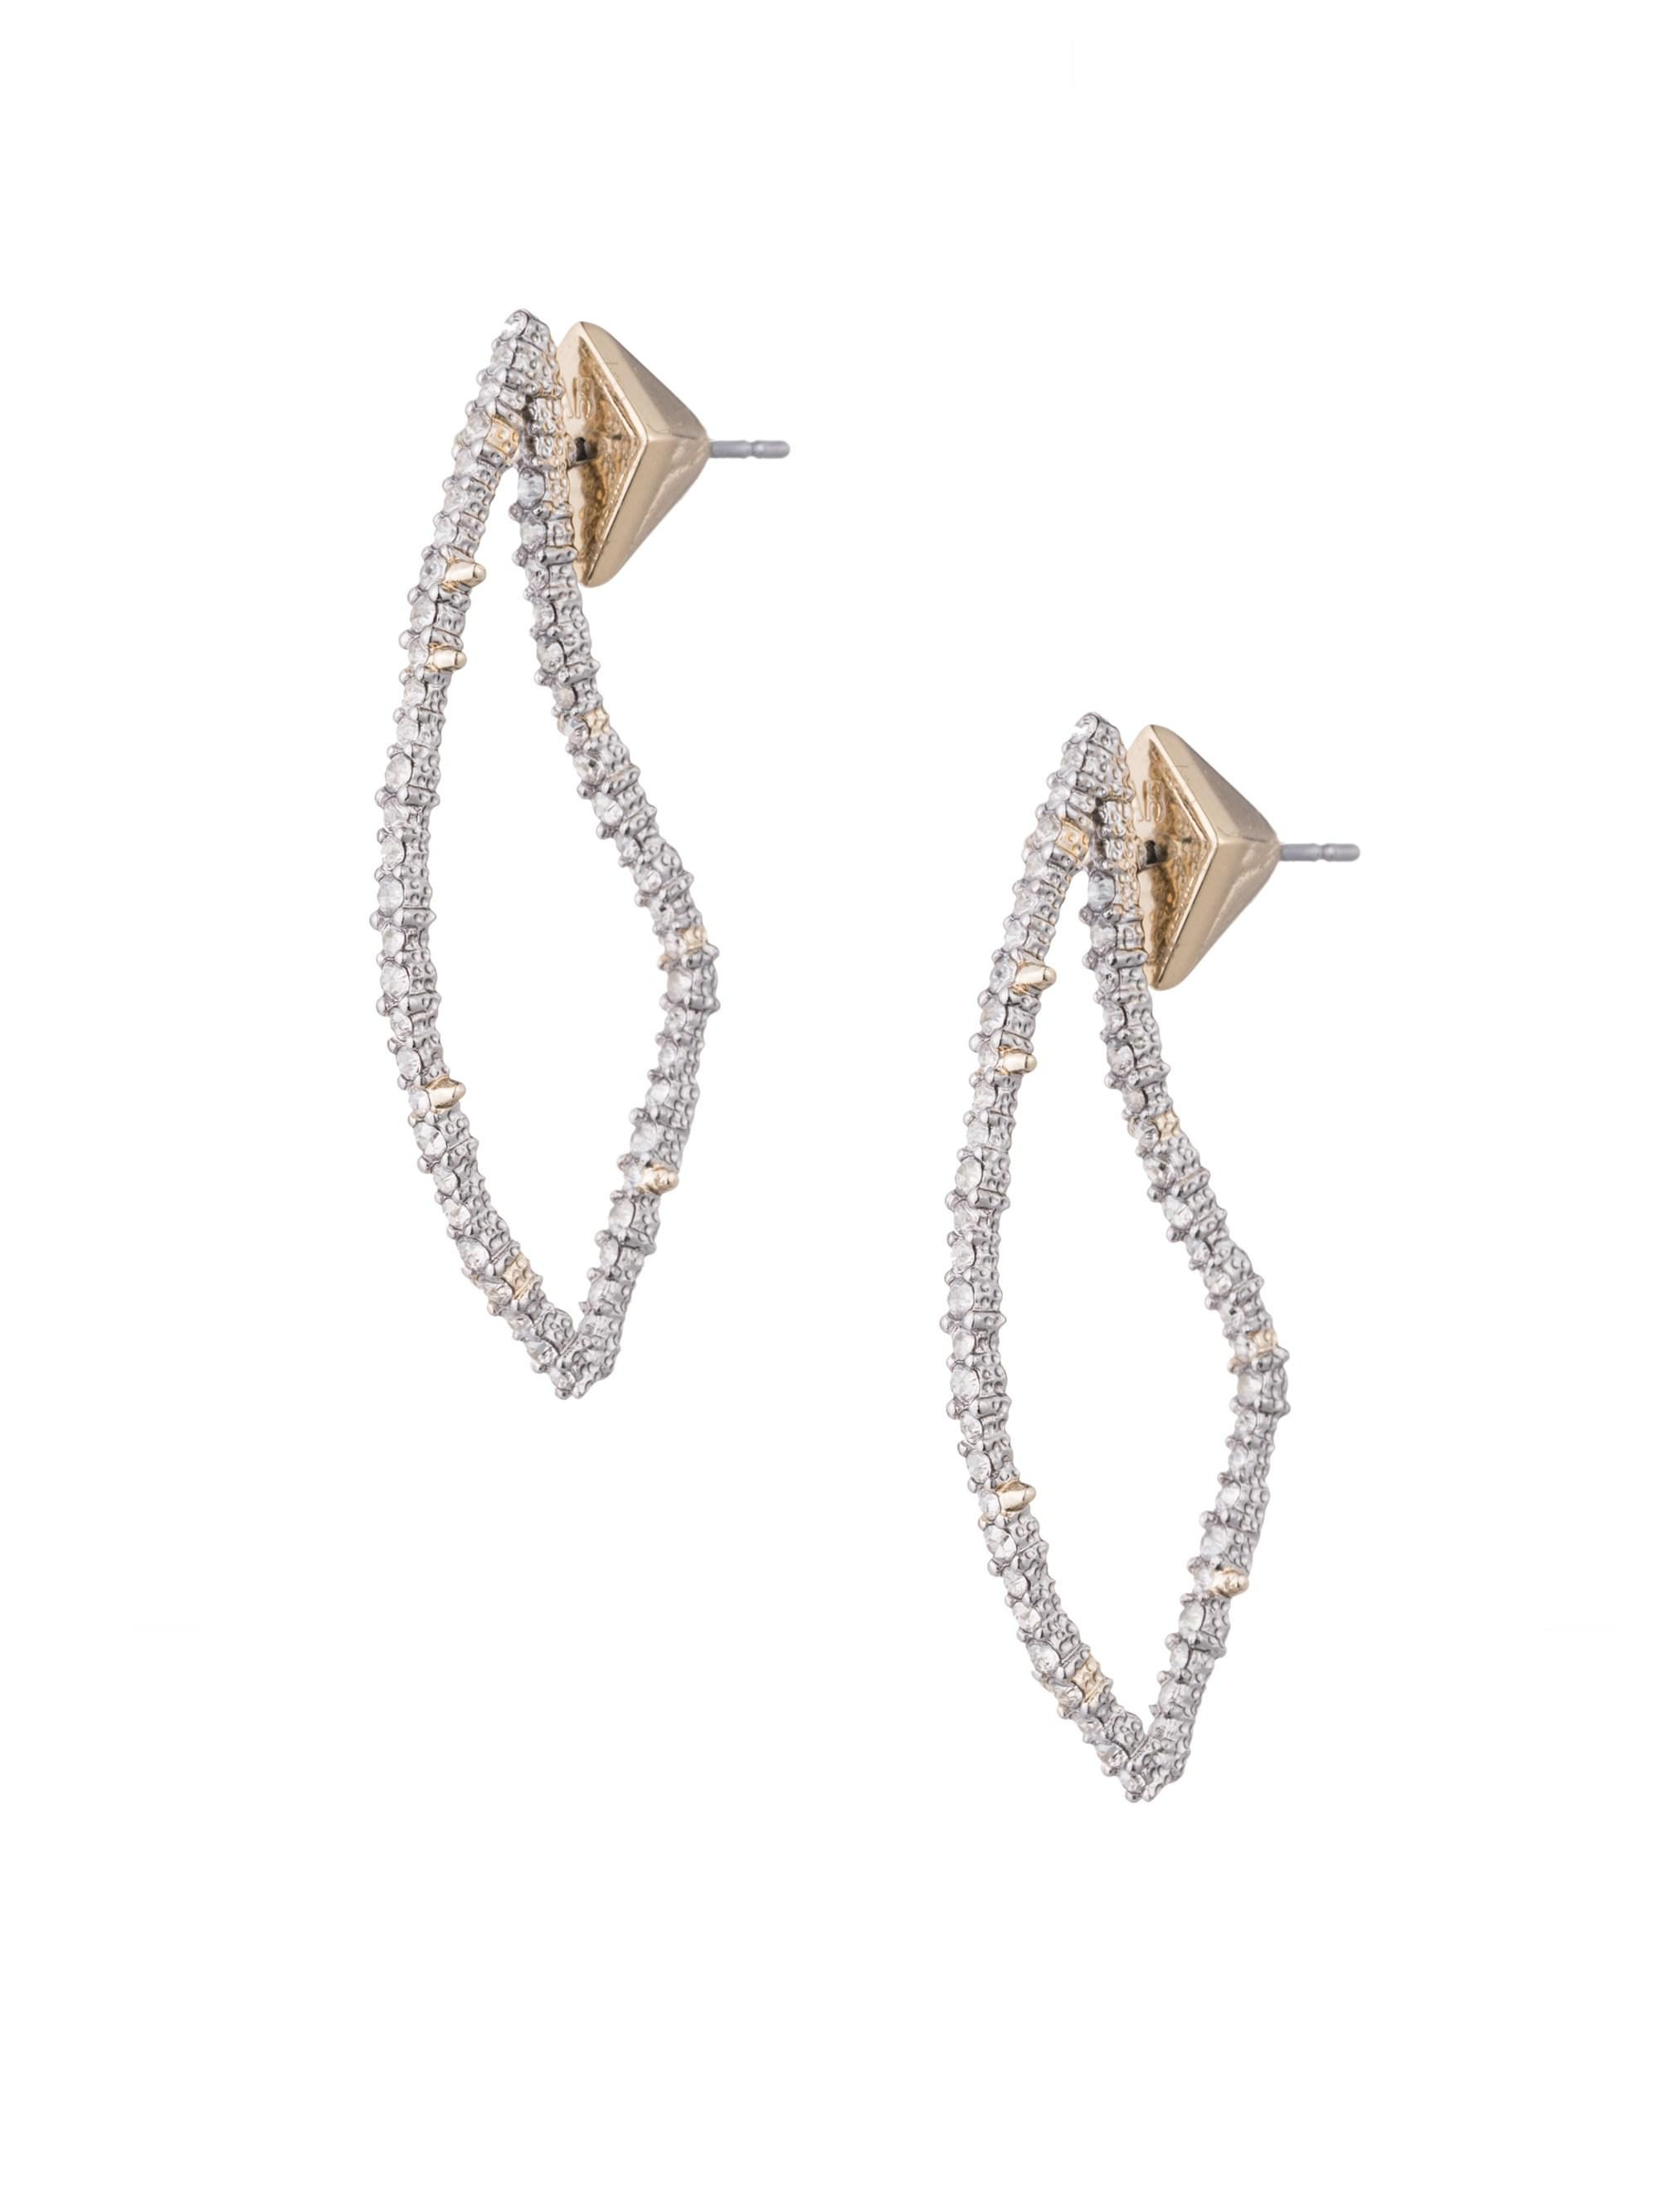 Alexis Bittar Women S Metallic Abstract Thorn Swarovski Crystal Post Earrings